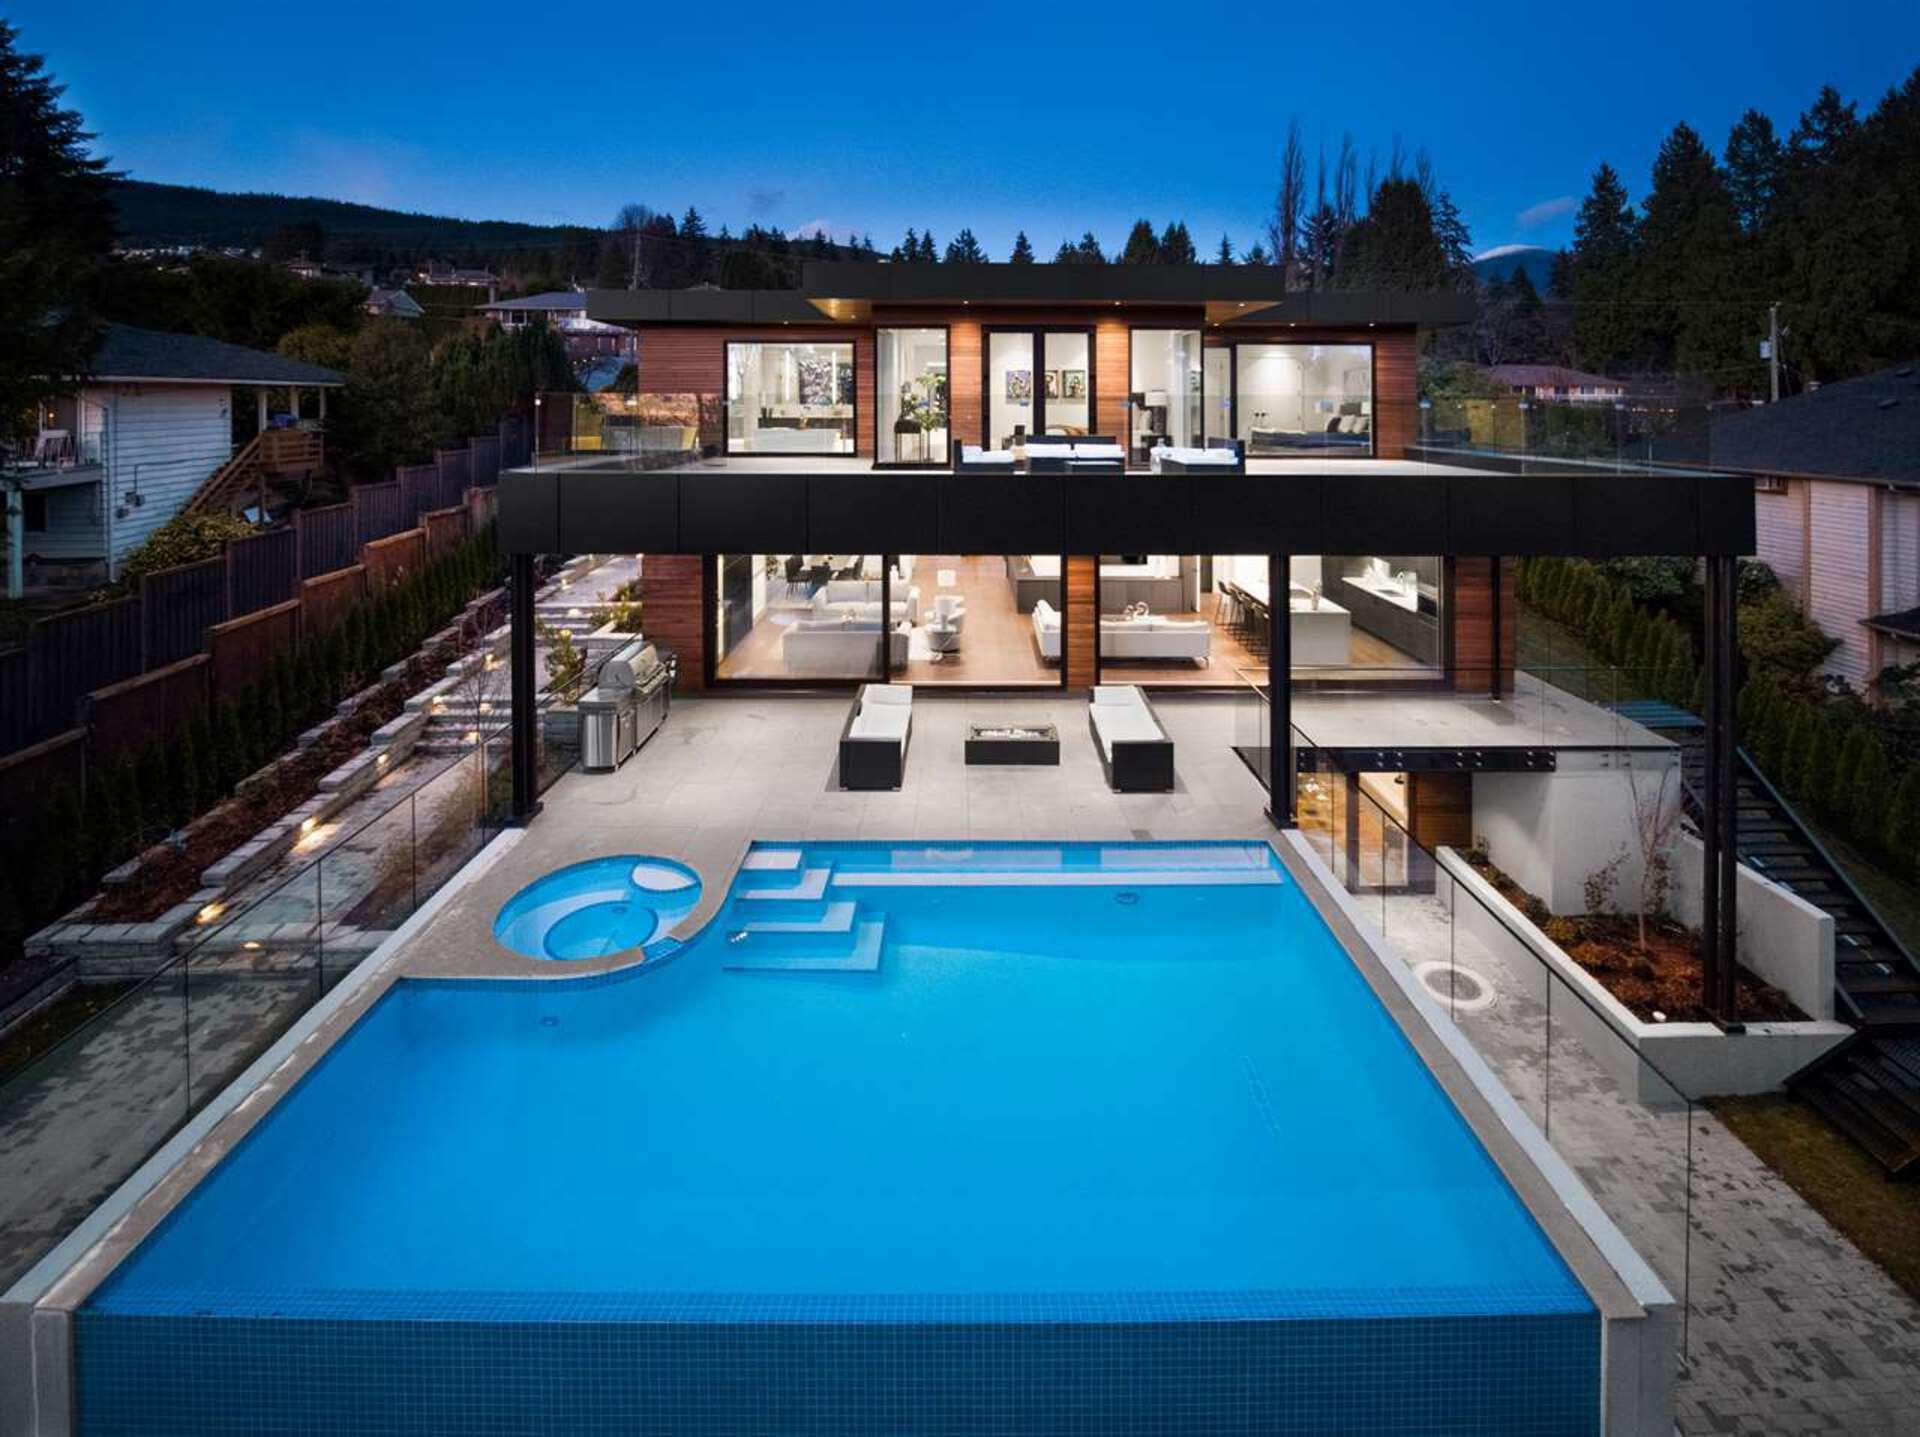 1040-wildwood-lane-british-properties-west-vancouver-02 at 1040 Wildwood Lane, British Properties, West Vancouver